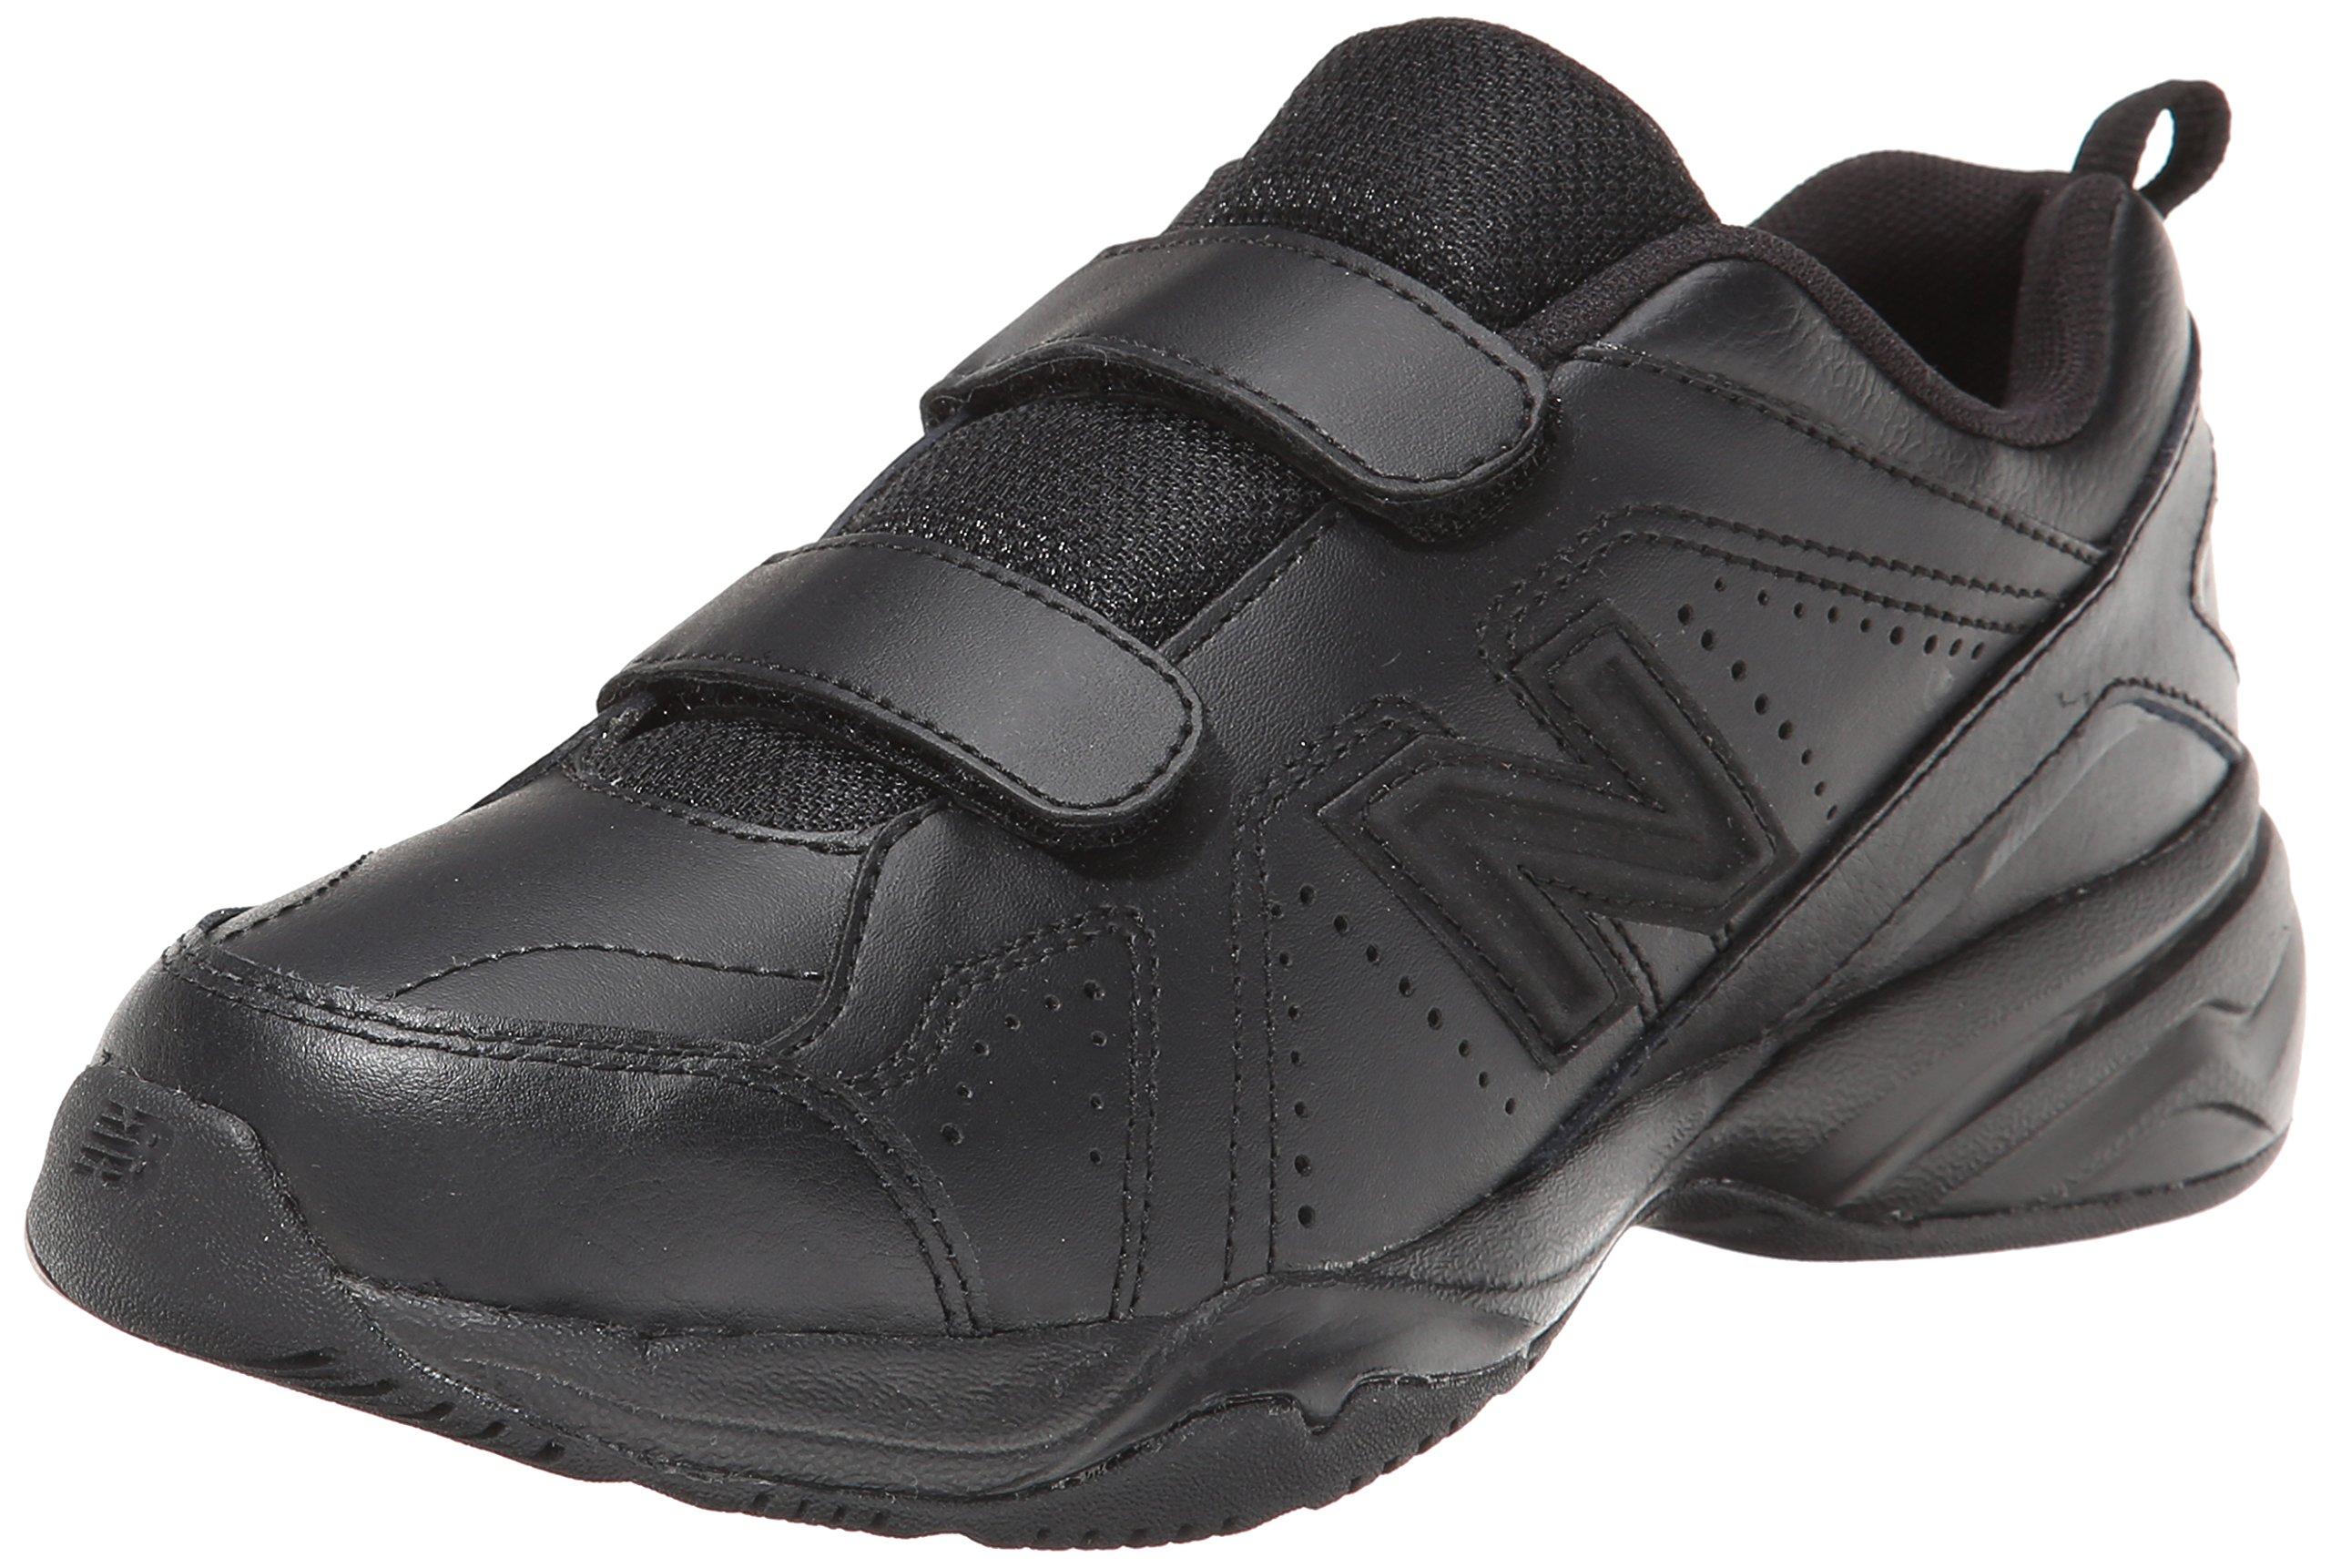 New Balance Boys' KV624 Hook and Loop Training Shoe, Black, 7 M US Big Kid